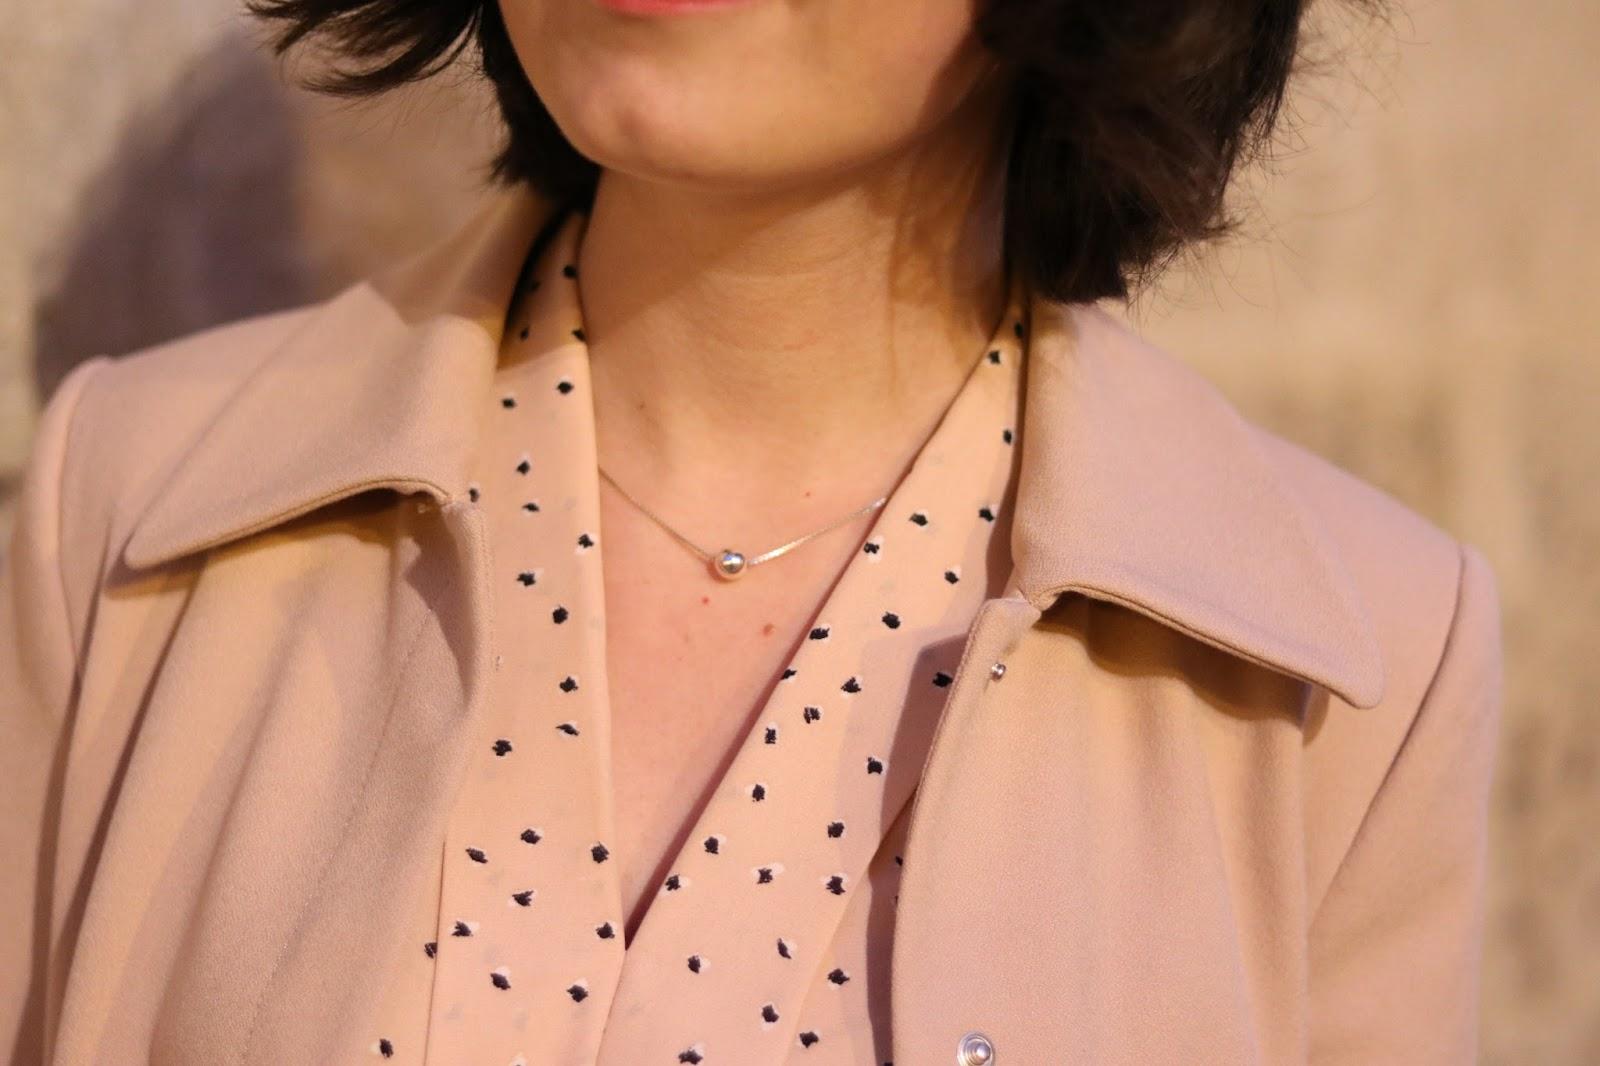 look femme mode paris la nuit rue parisienne zara primark pull&bear jean taille haute rose